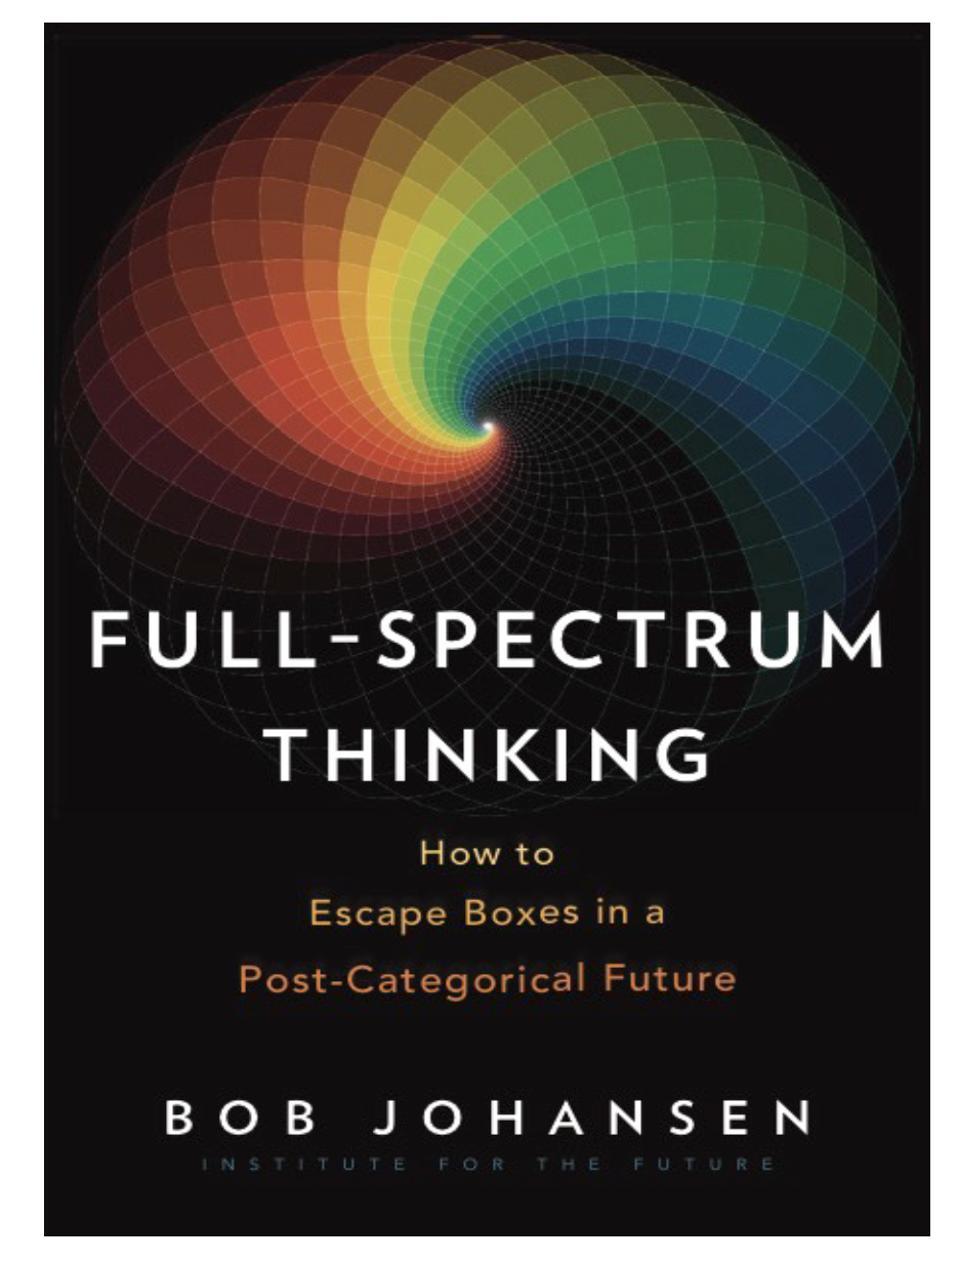 Full-spectrum thinking book